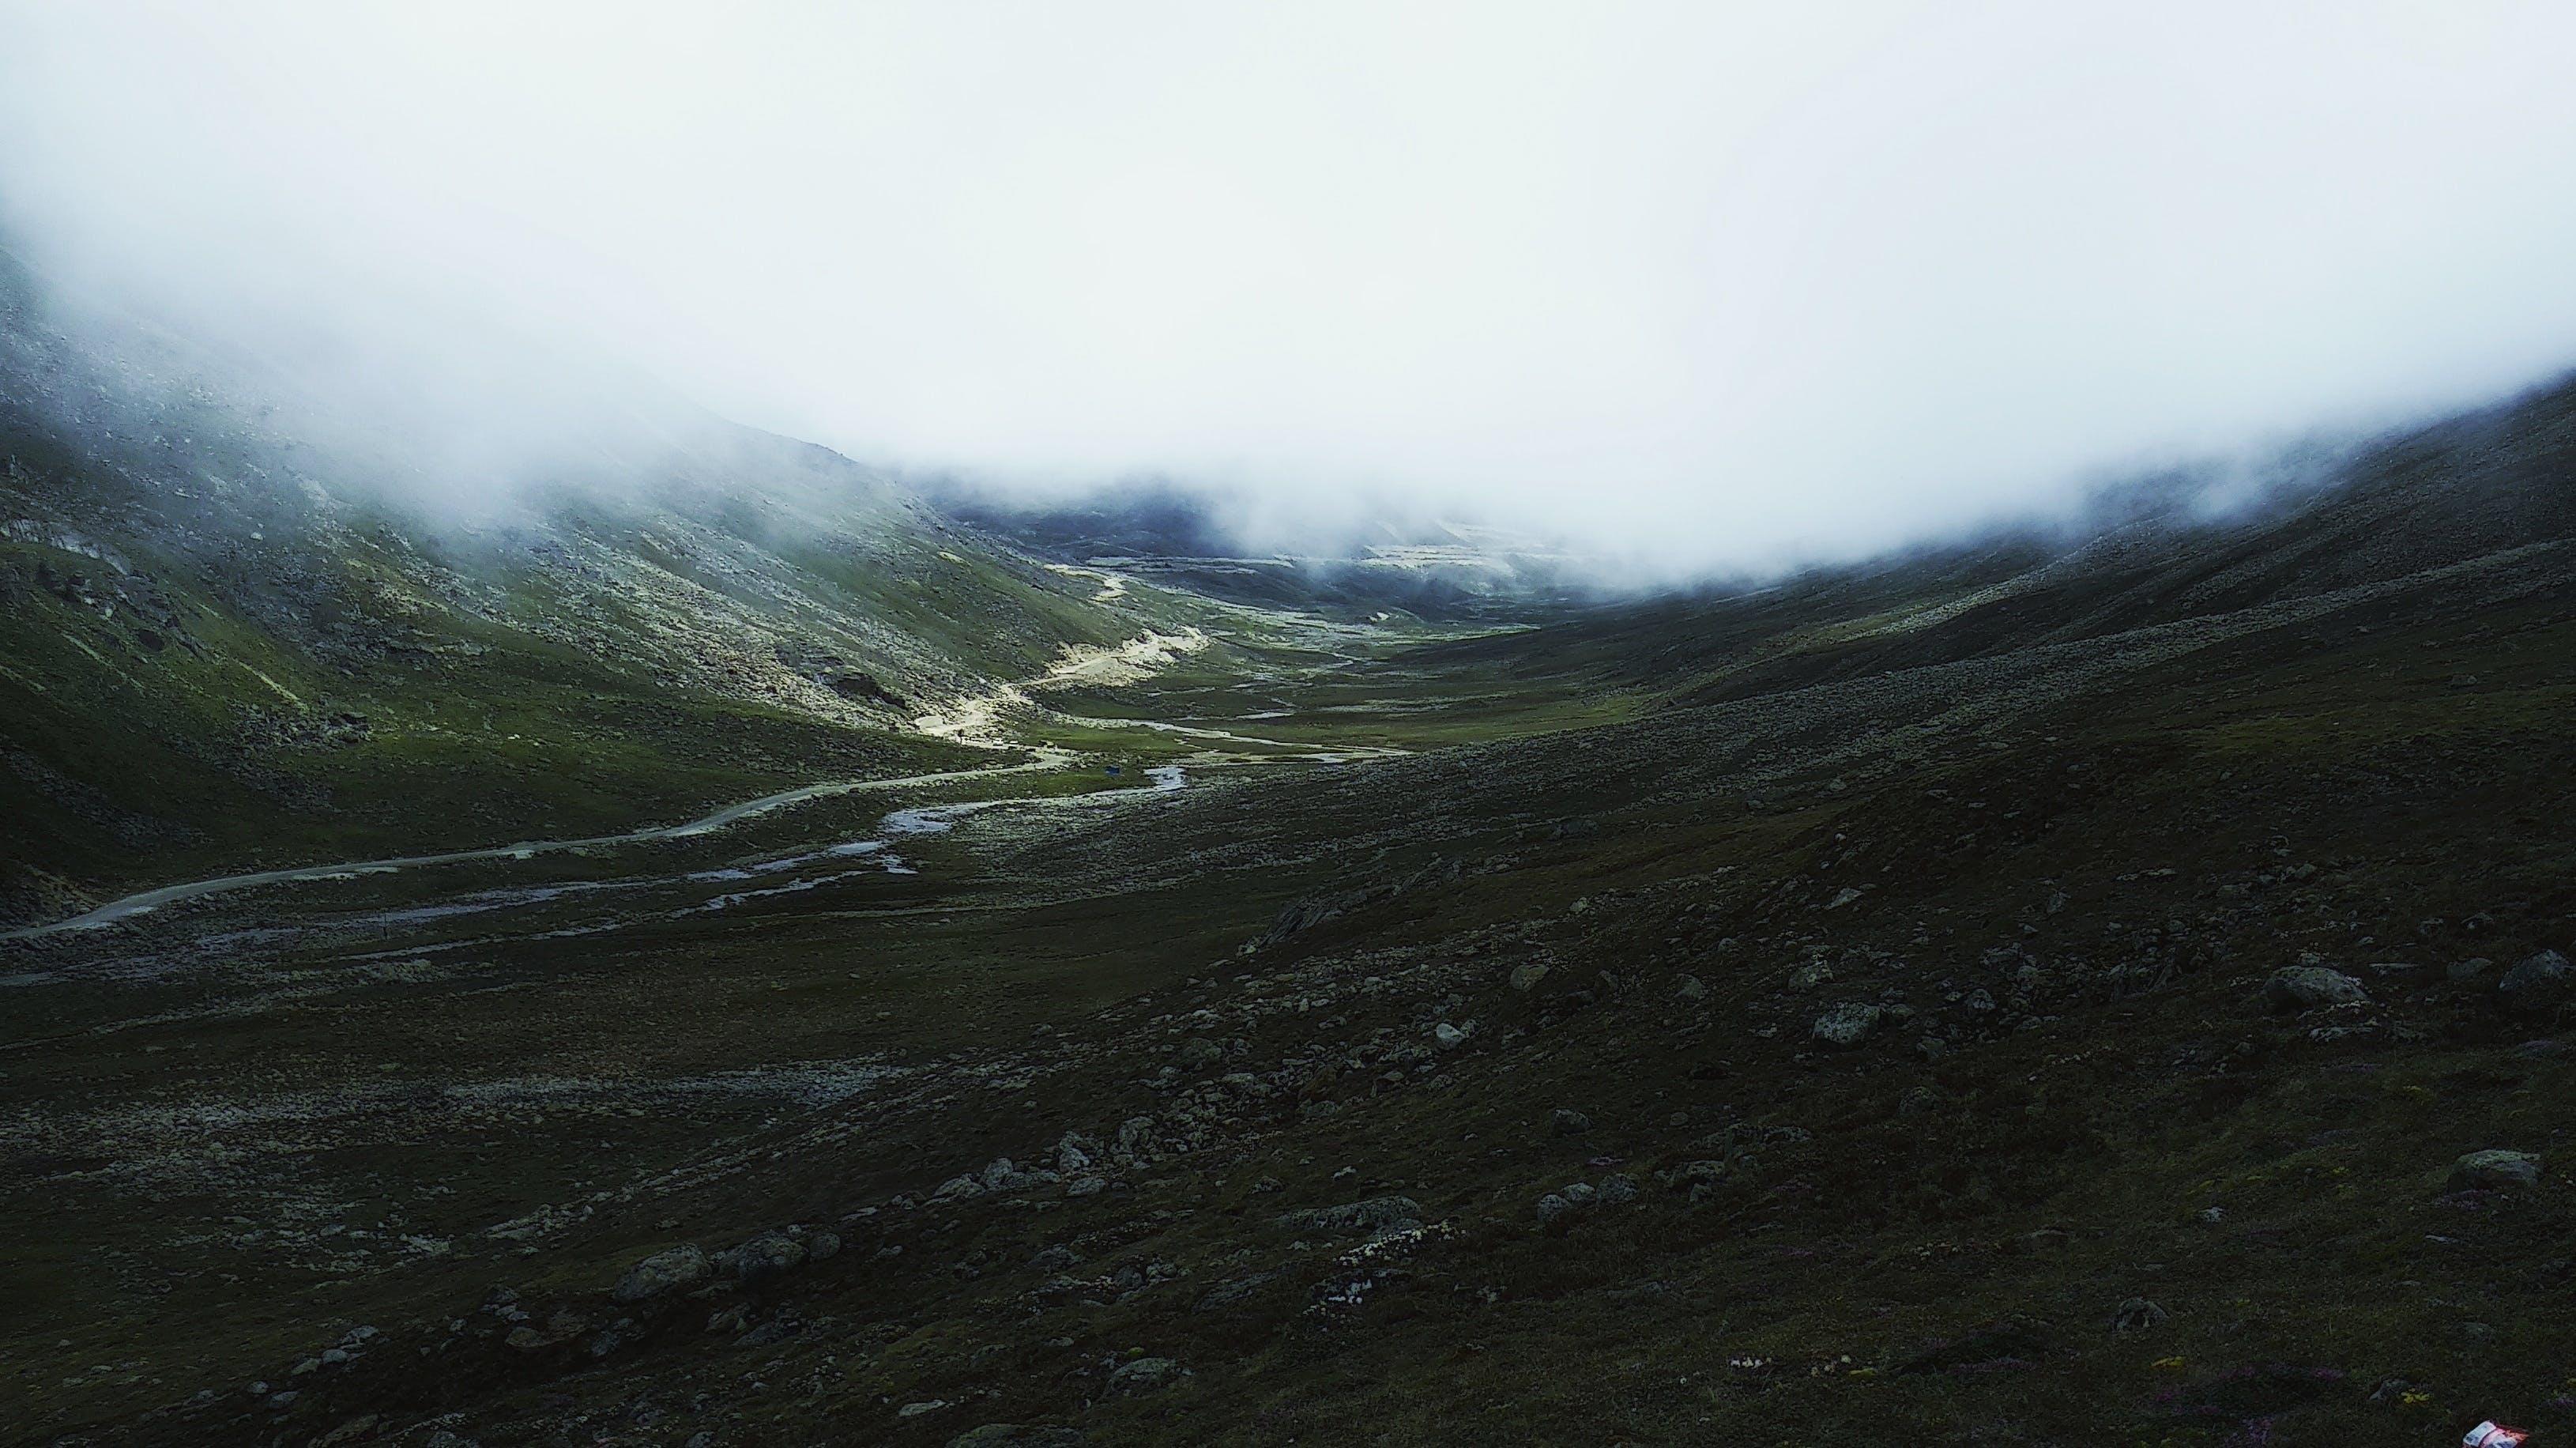 White Clouds Near Green Mountain